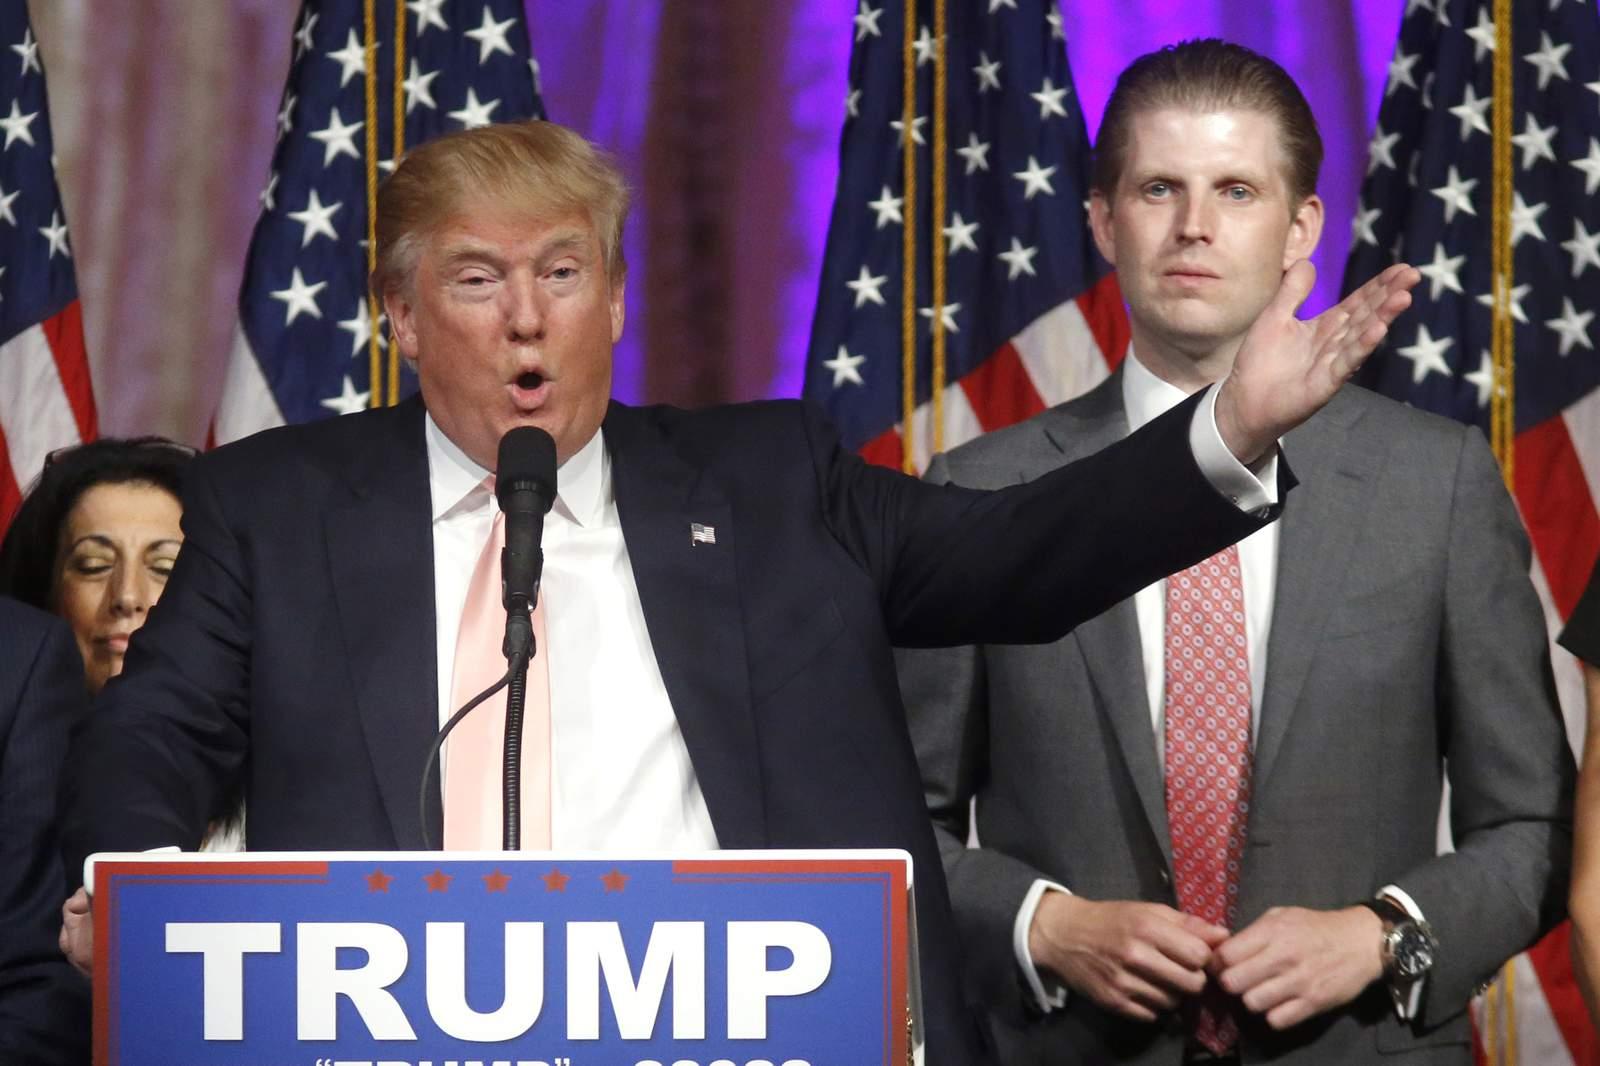 Trust Index Viral Tweet About Trump Impeachment Consequences Lacks Context